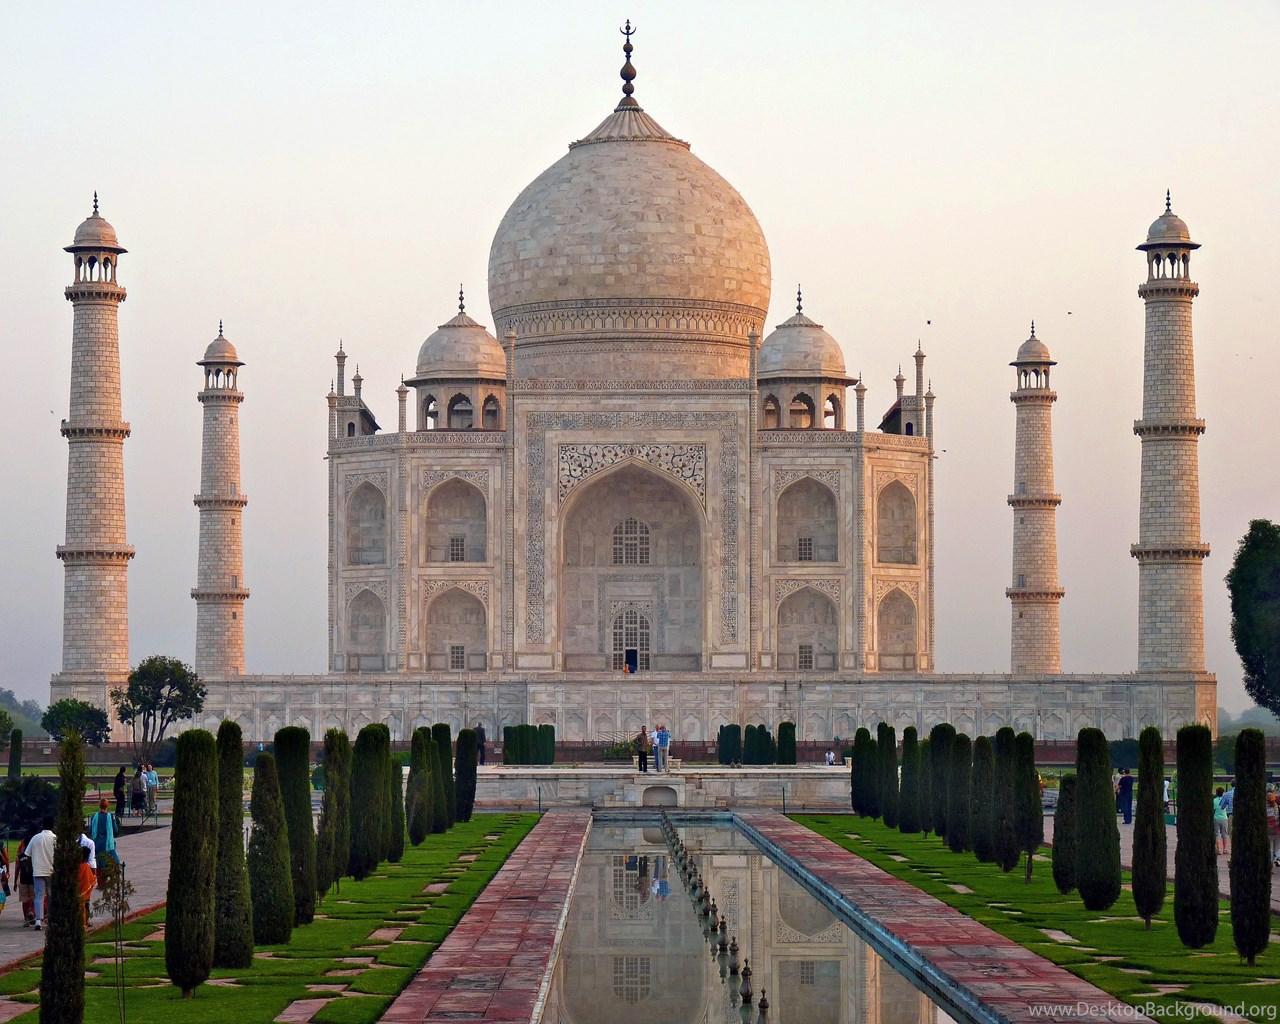 Taj mahal 1080p hd wallpapers desktop background - Taj mahal background hd ...